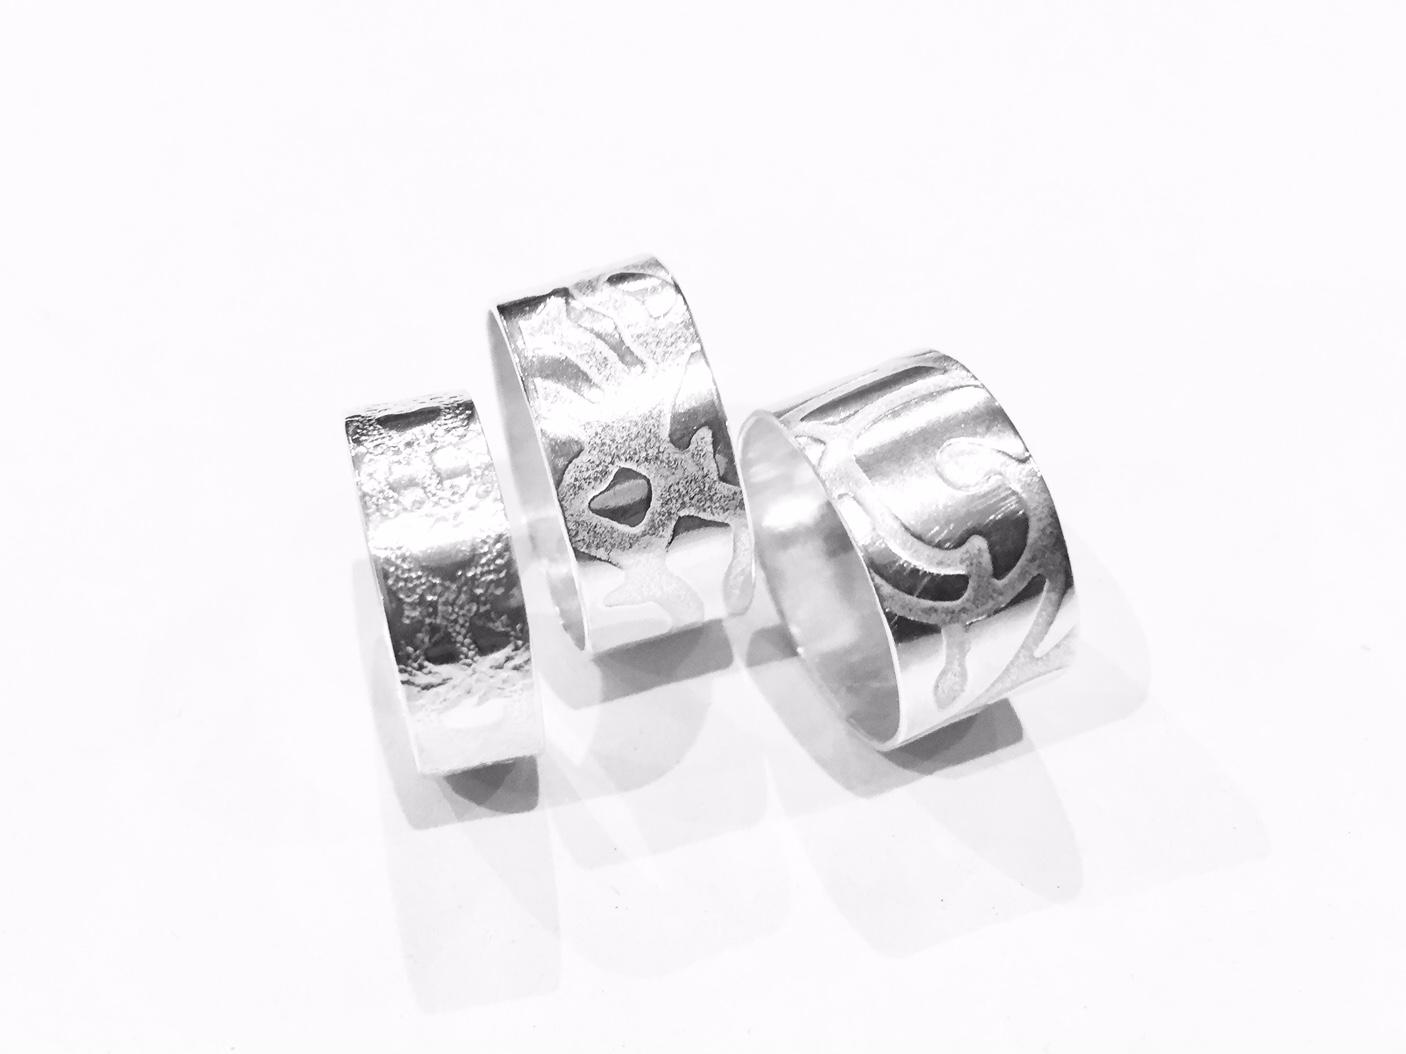 bg-silver-rings-2.jpeg